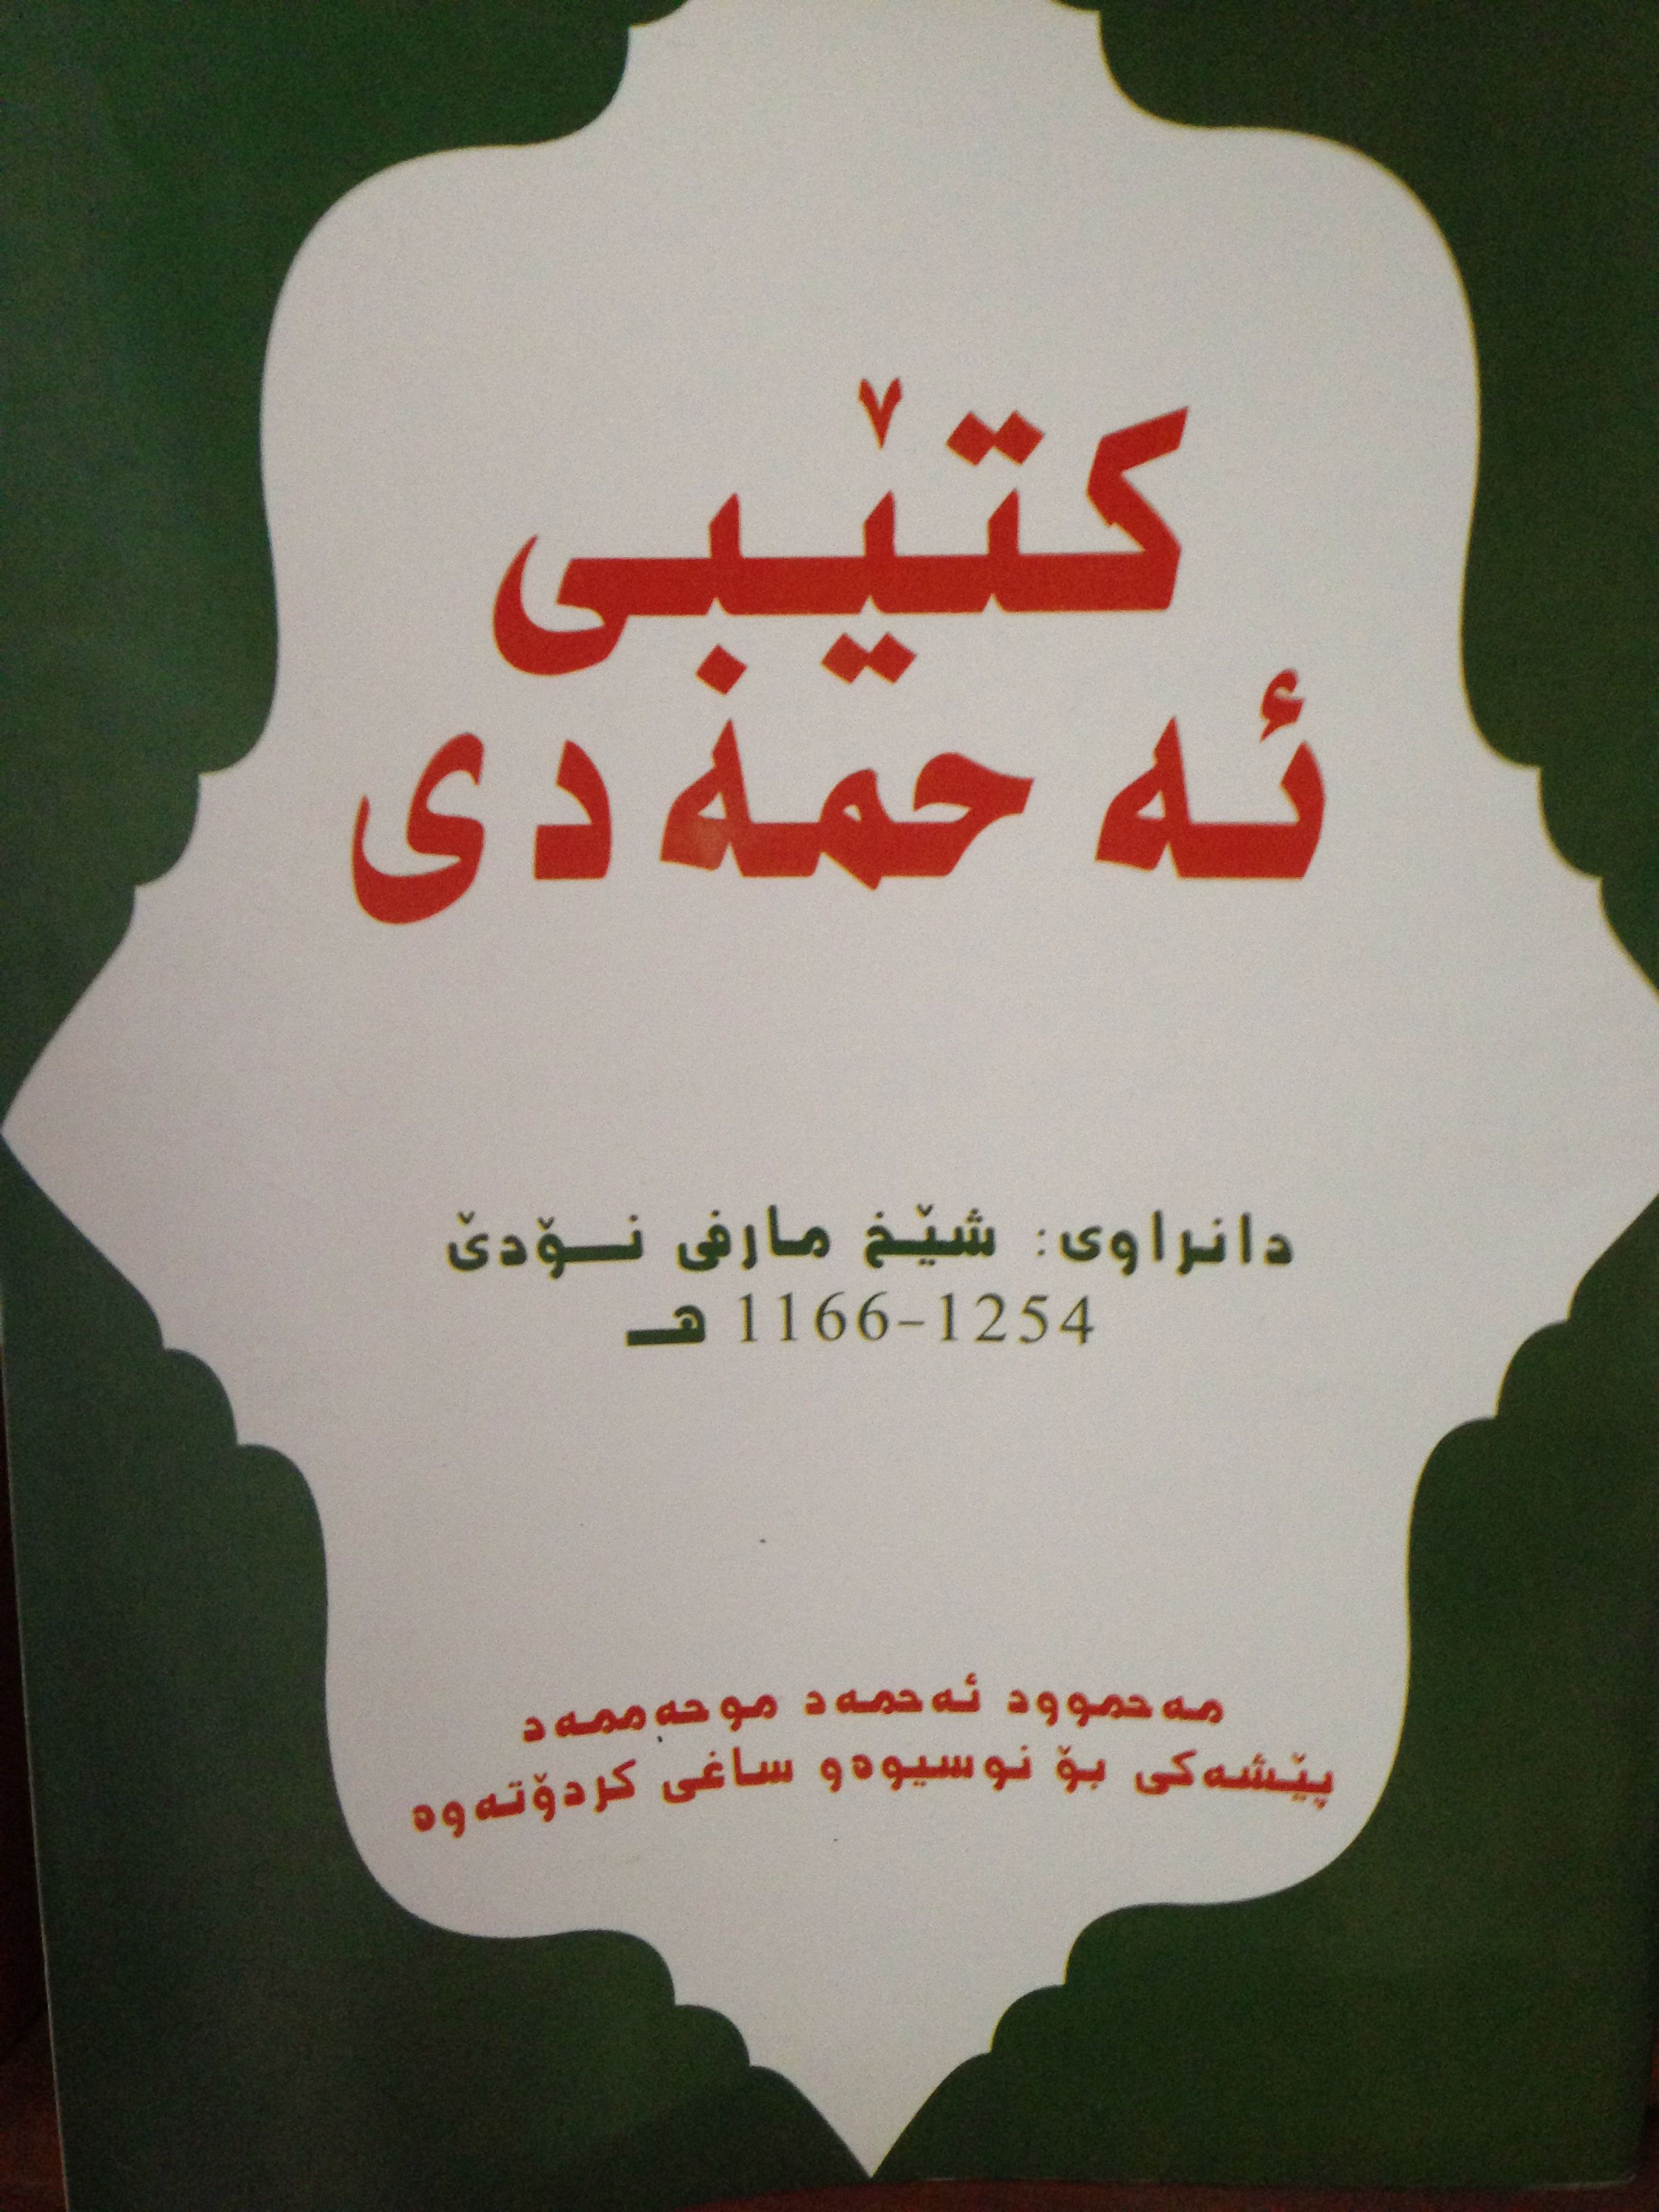 قاموس كوردي عربي به شيوةي شعري Koozies Drink Sleeves